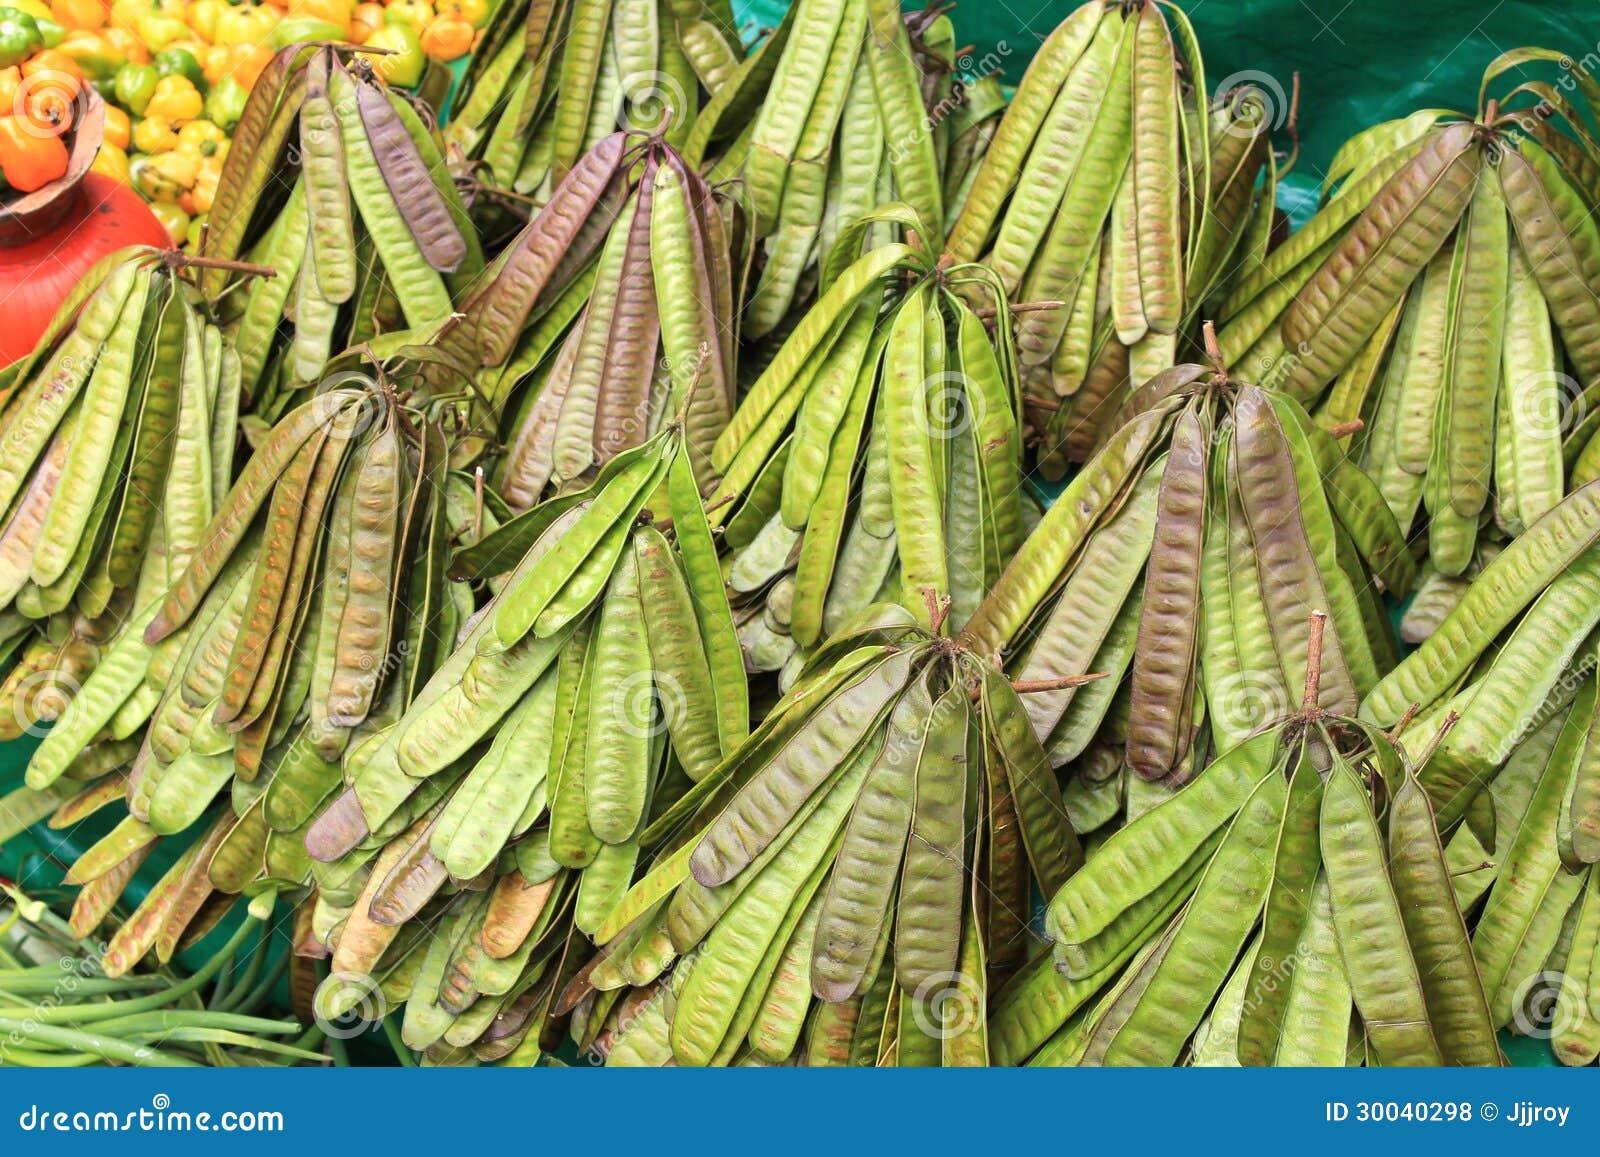 Bundles of bean pods for sale at a farmers market in San Cristobal de ...